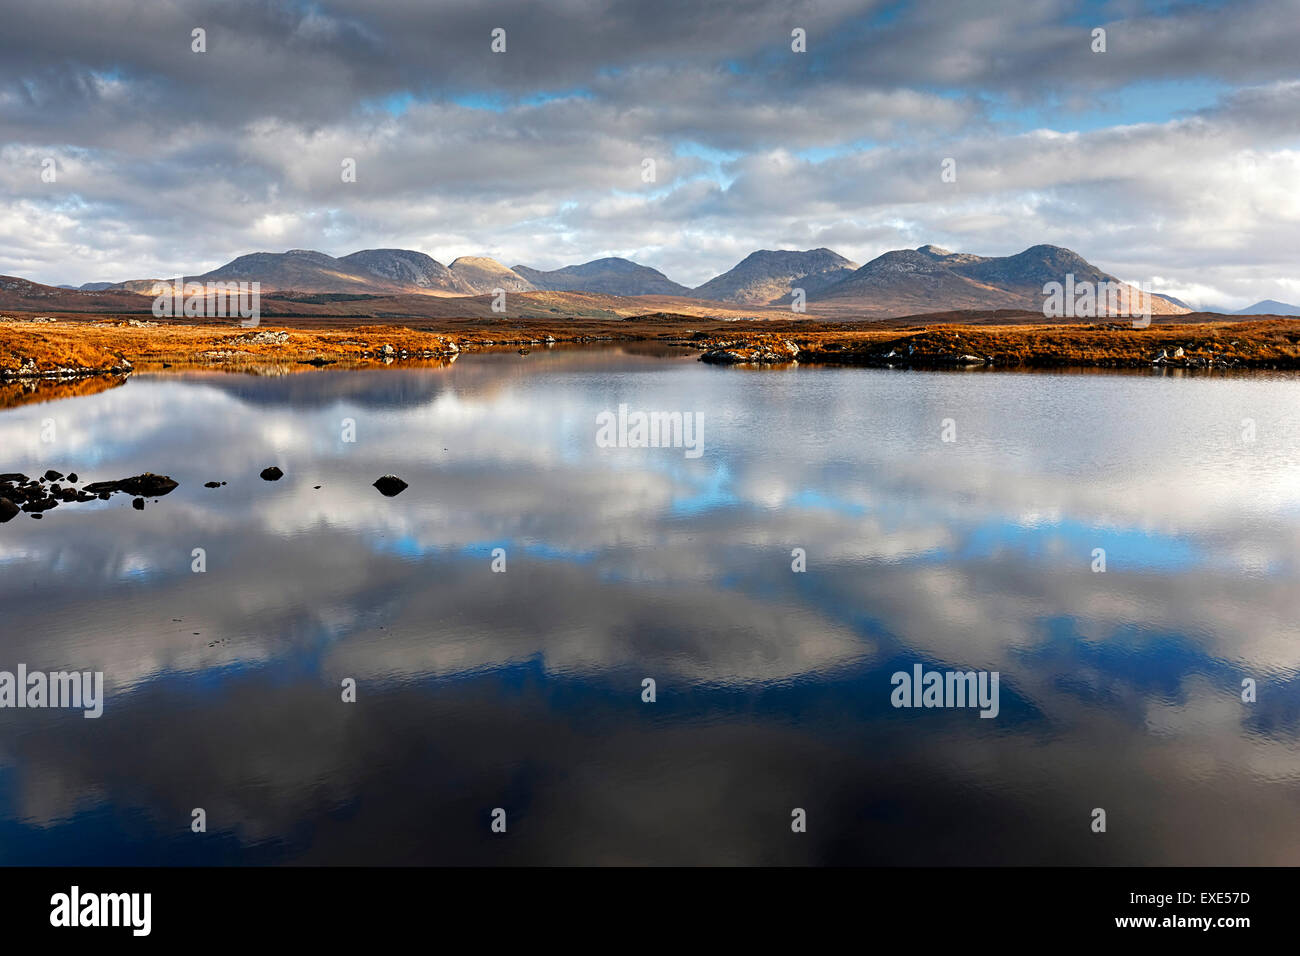 The Twelve Bens, Irish Landscape, Connemara, County Galway, Republic of Ireland, Europe. - Stock Image